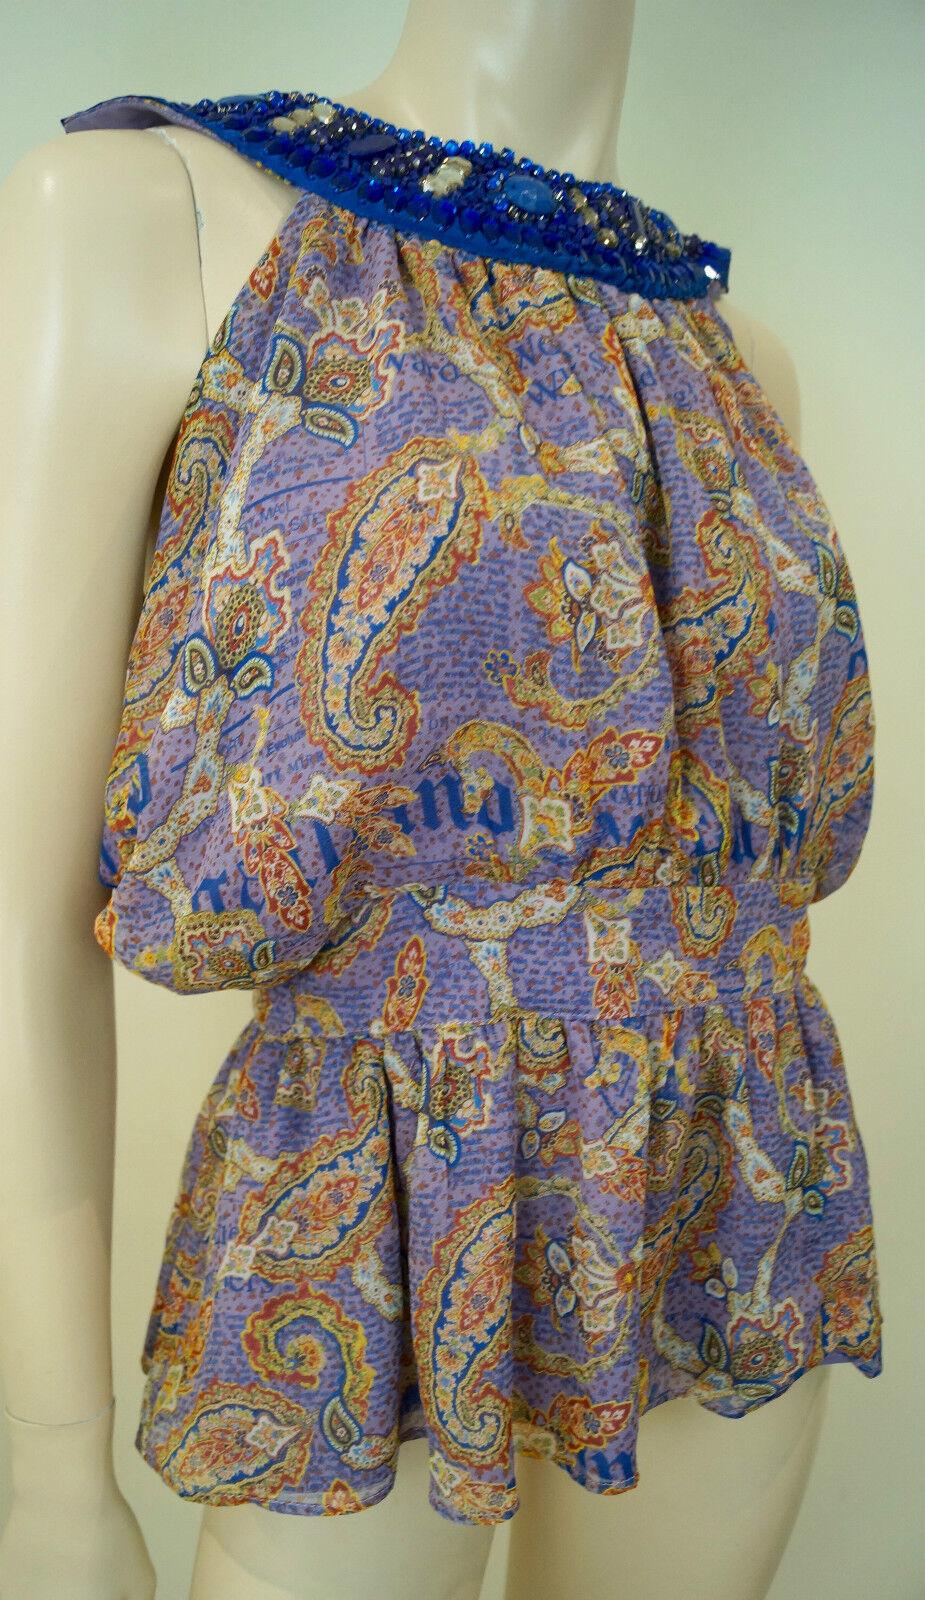 GALLIANO Lilac Silk Multi Print Blau Sequin Neck Sleeveless Blouse Top BNWT